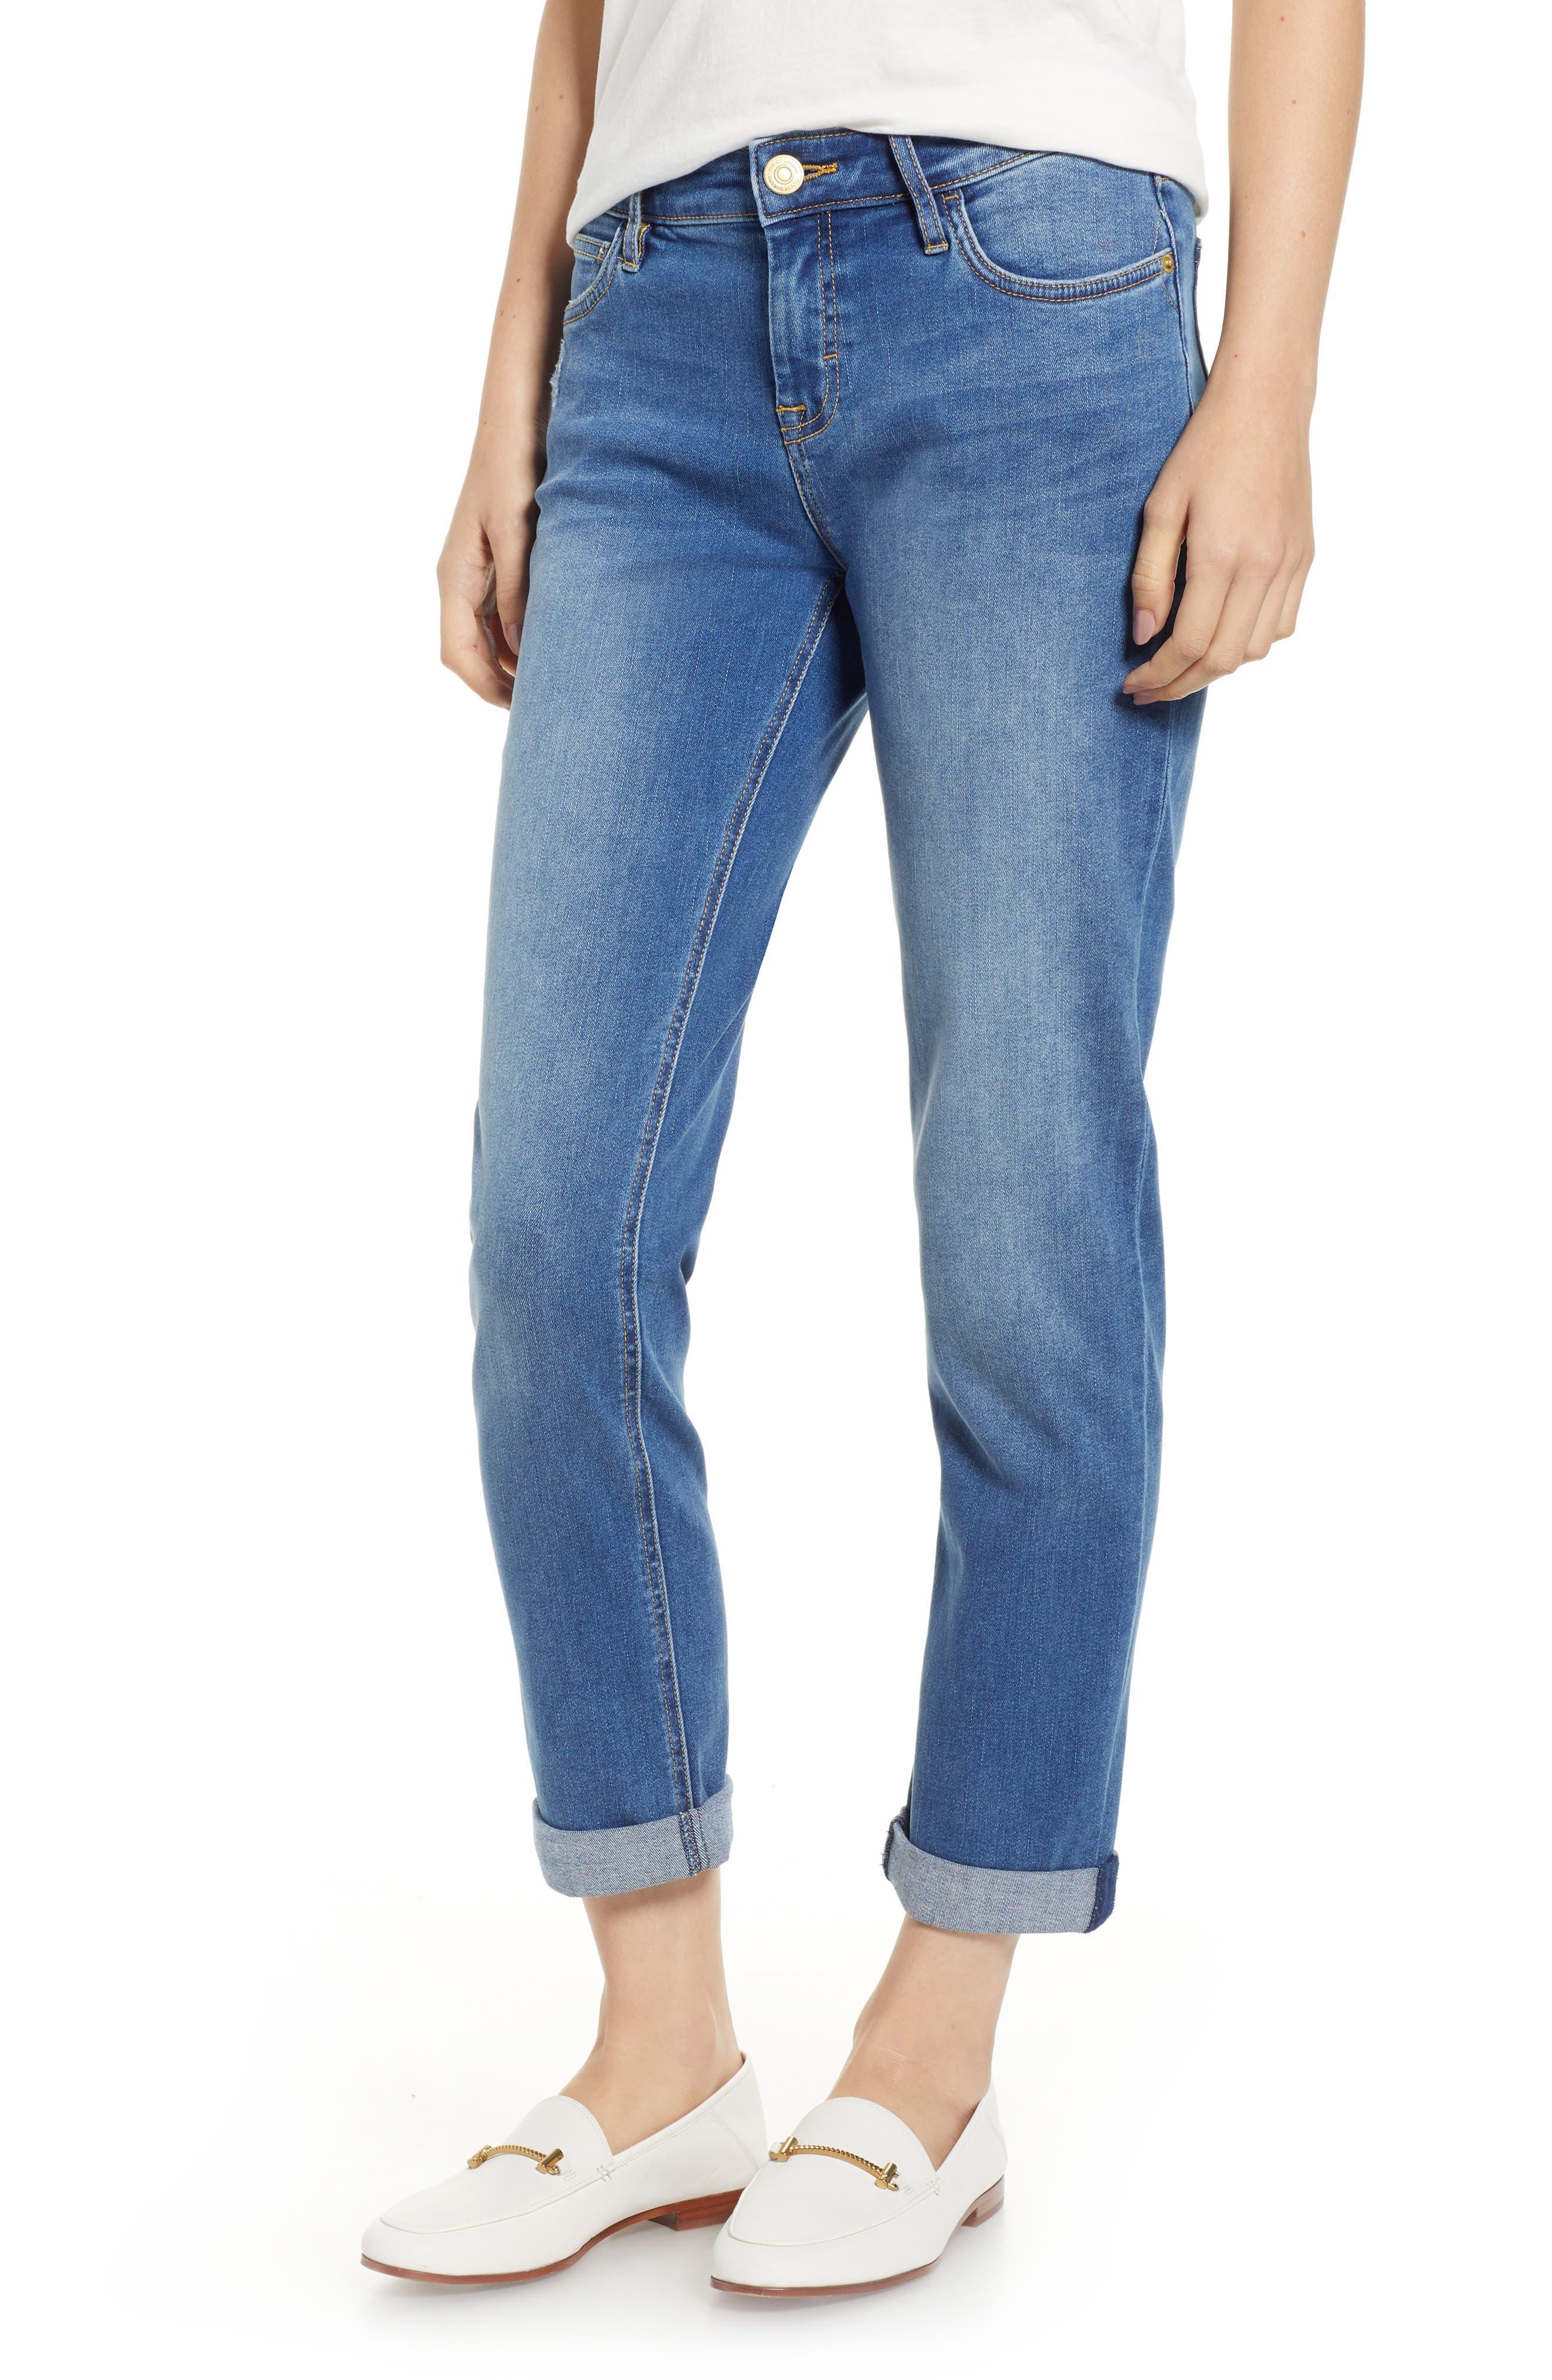 Tema Slim Boyfriend Jeans,                         Main,                         color, MEDIUM BEACH WASH